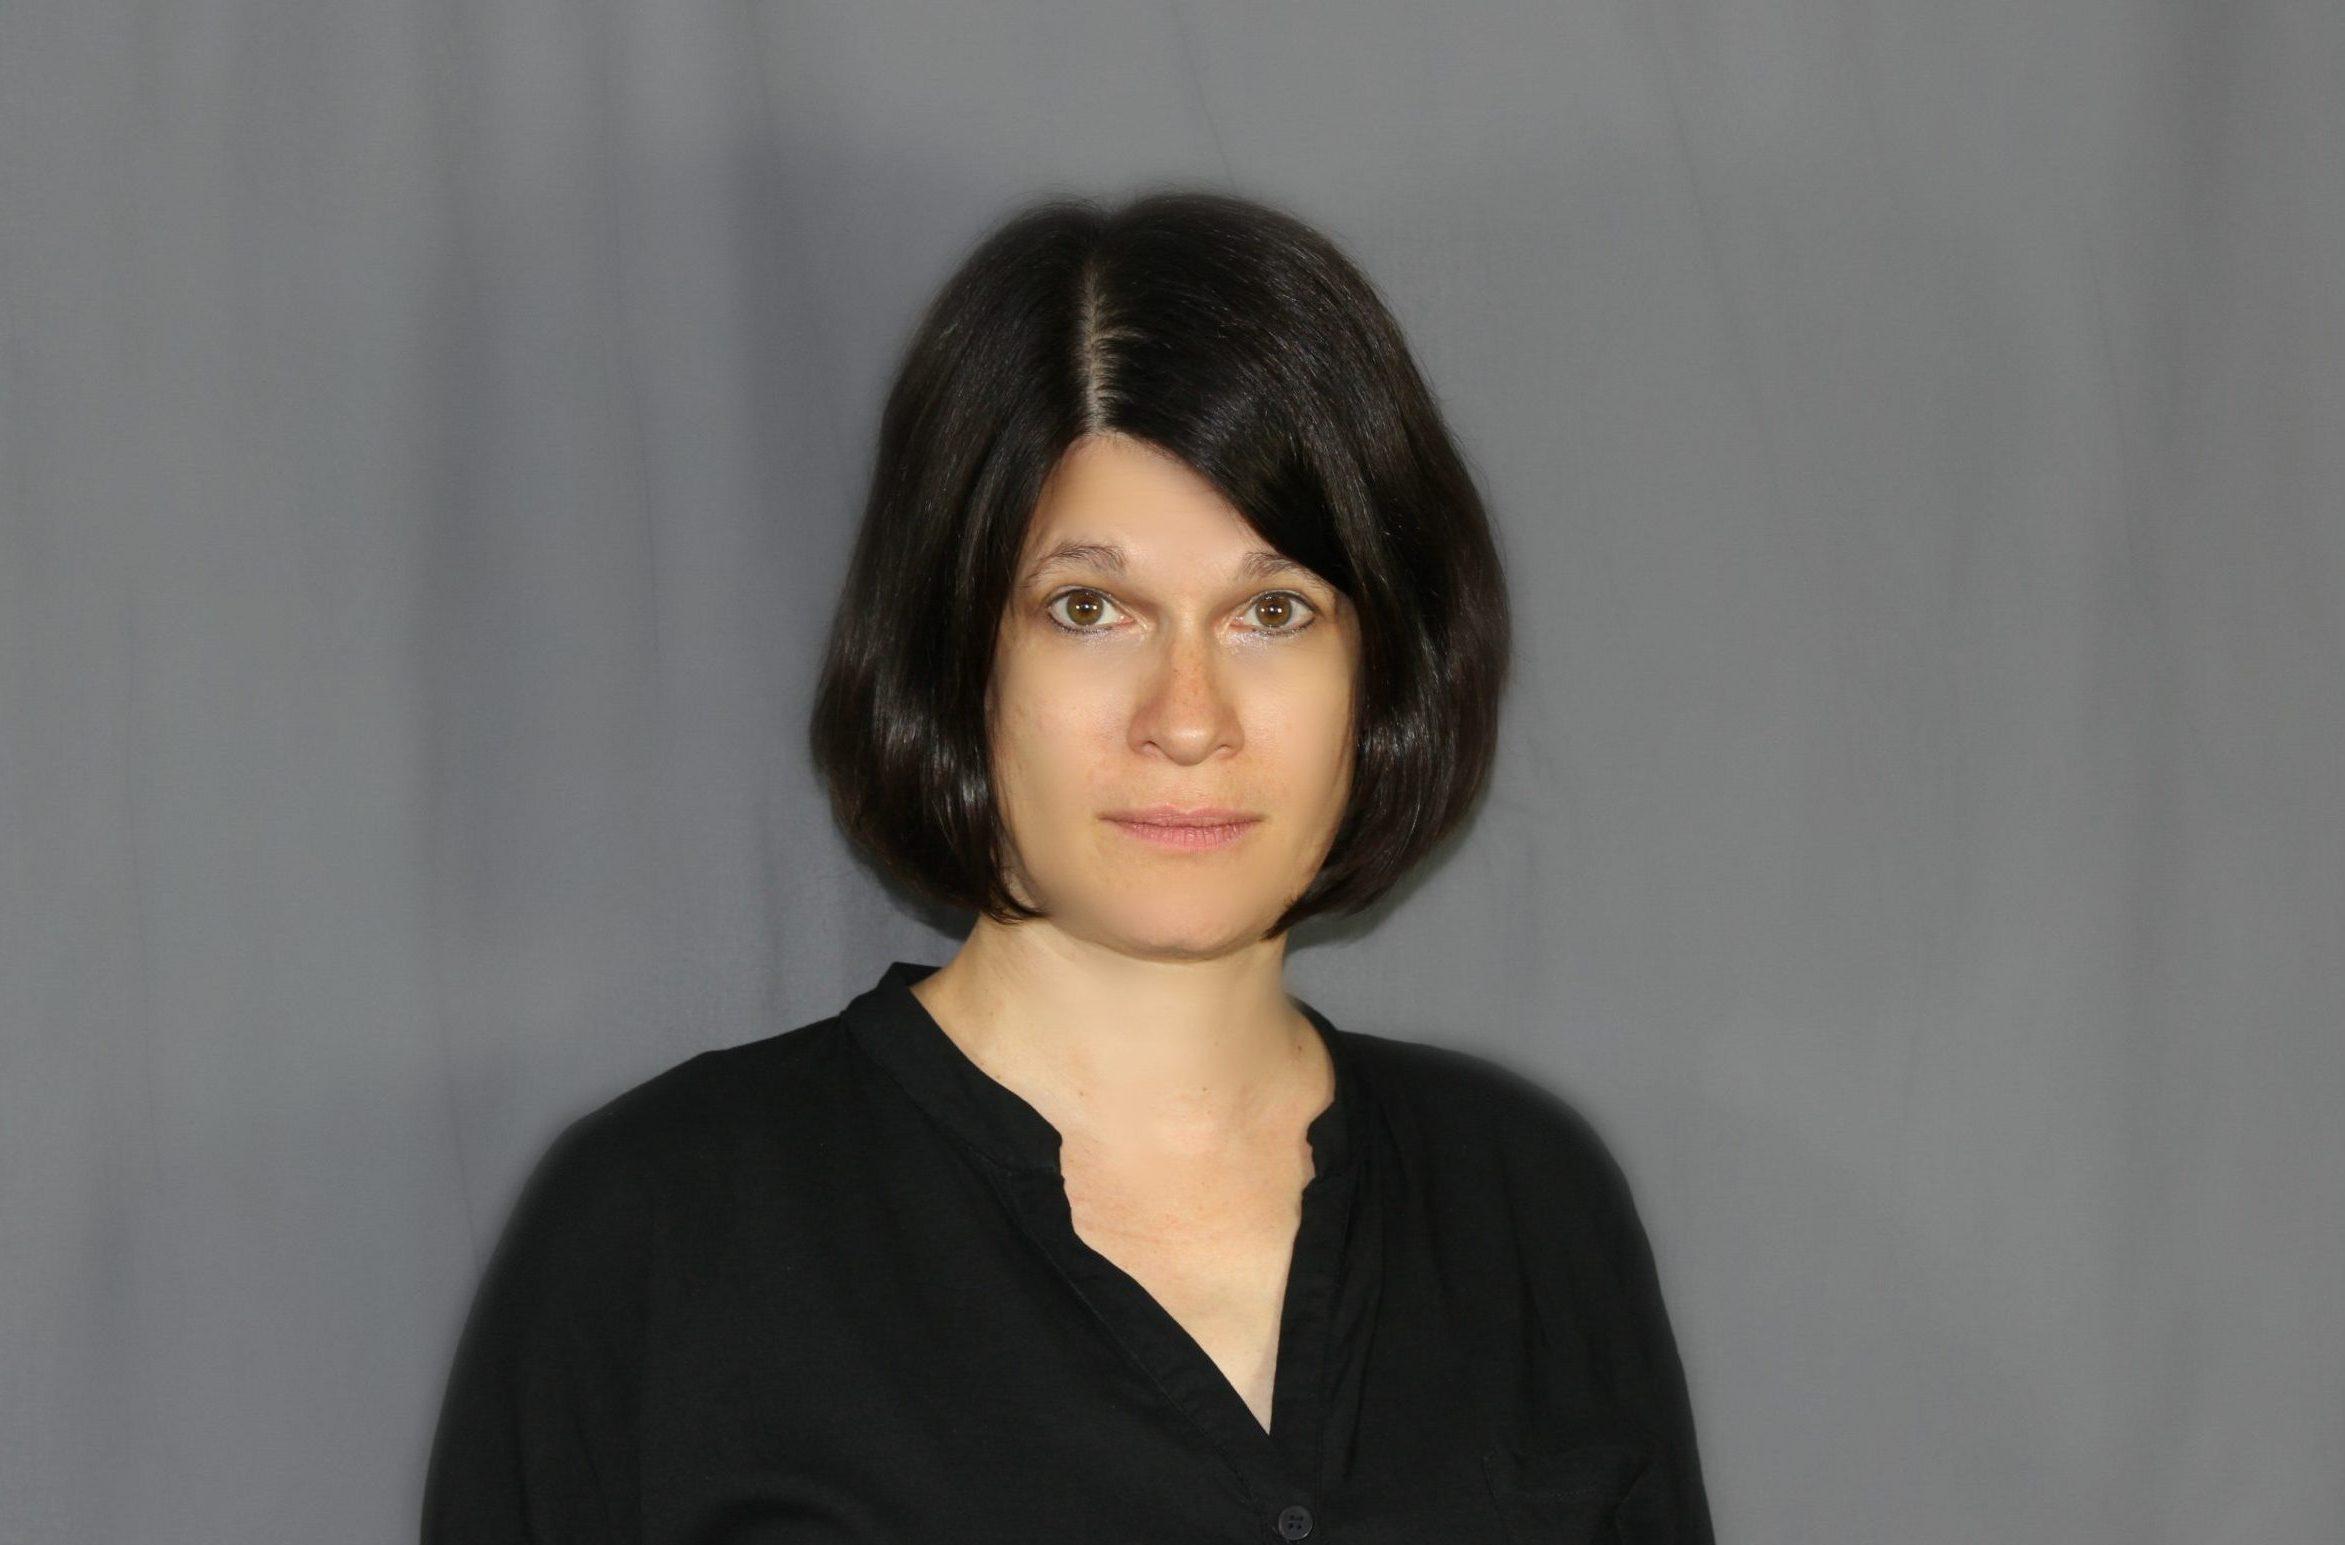 Isabel Pascher